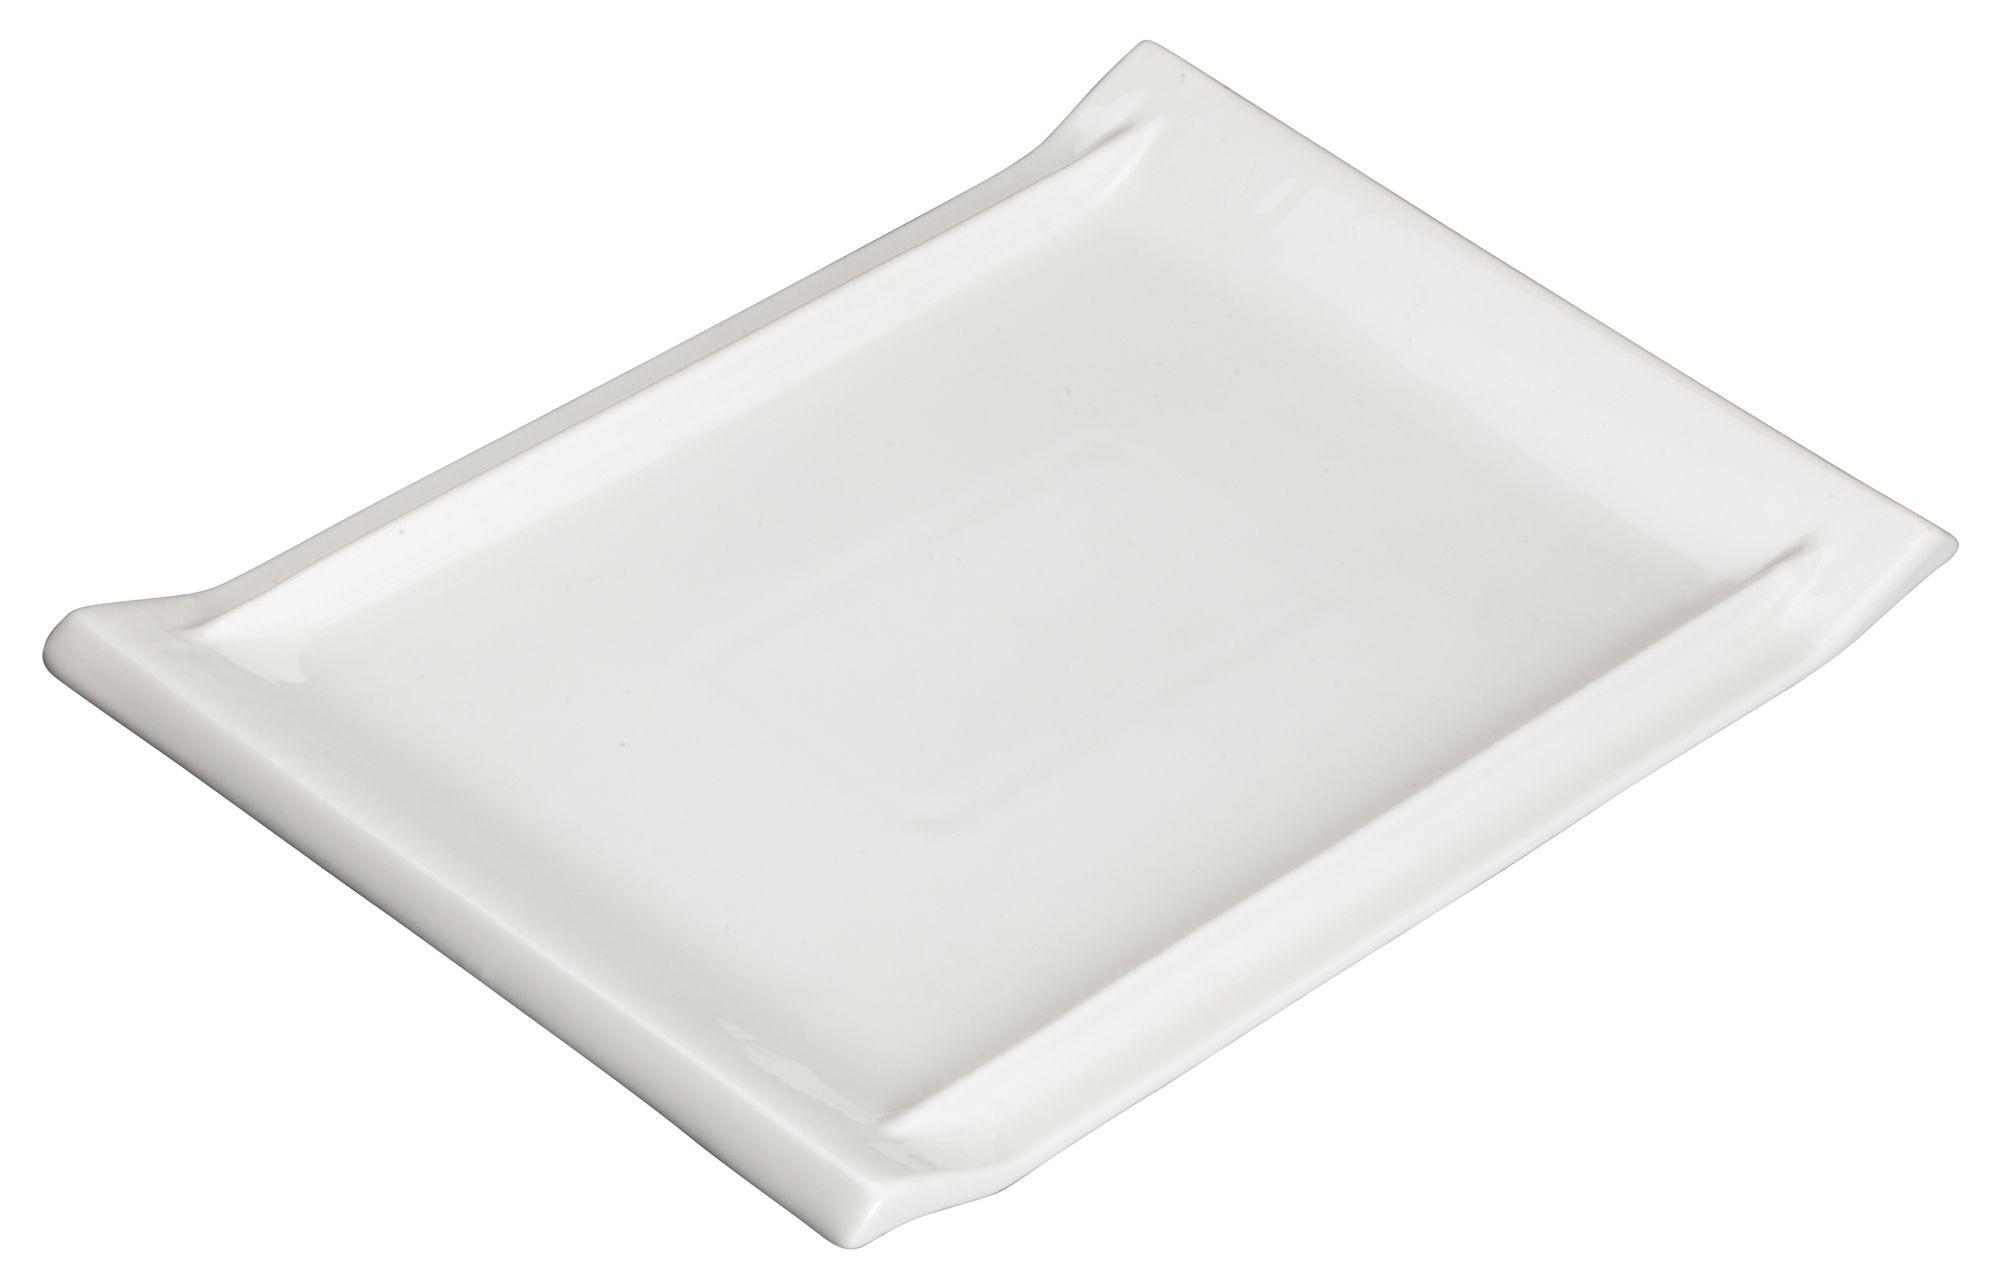 "Winco WDP017-111 Tollaro Porcelain Bright White Rectangular Platter 10-1/8"" x 7"""